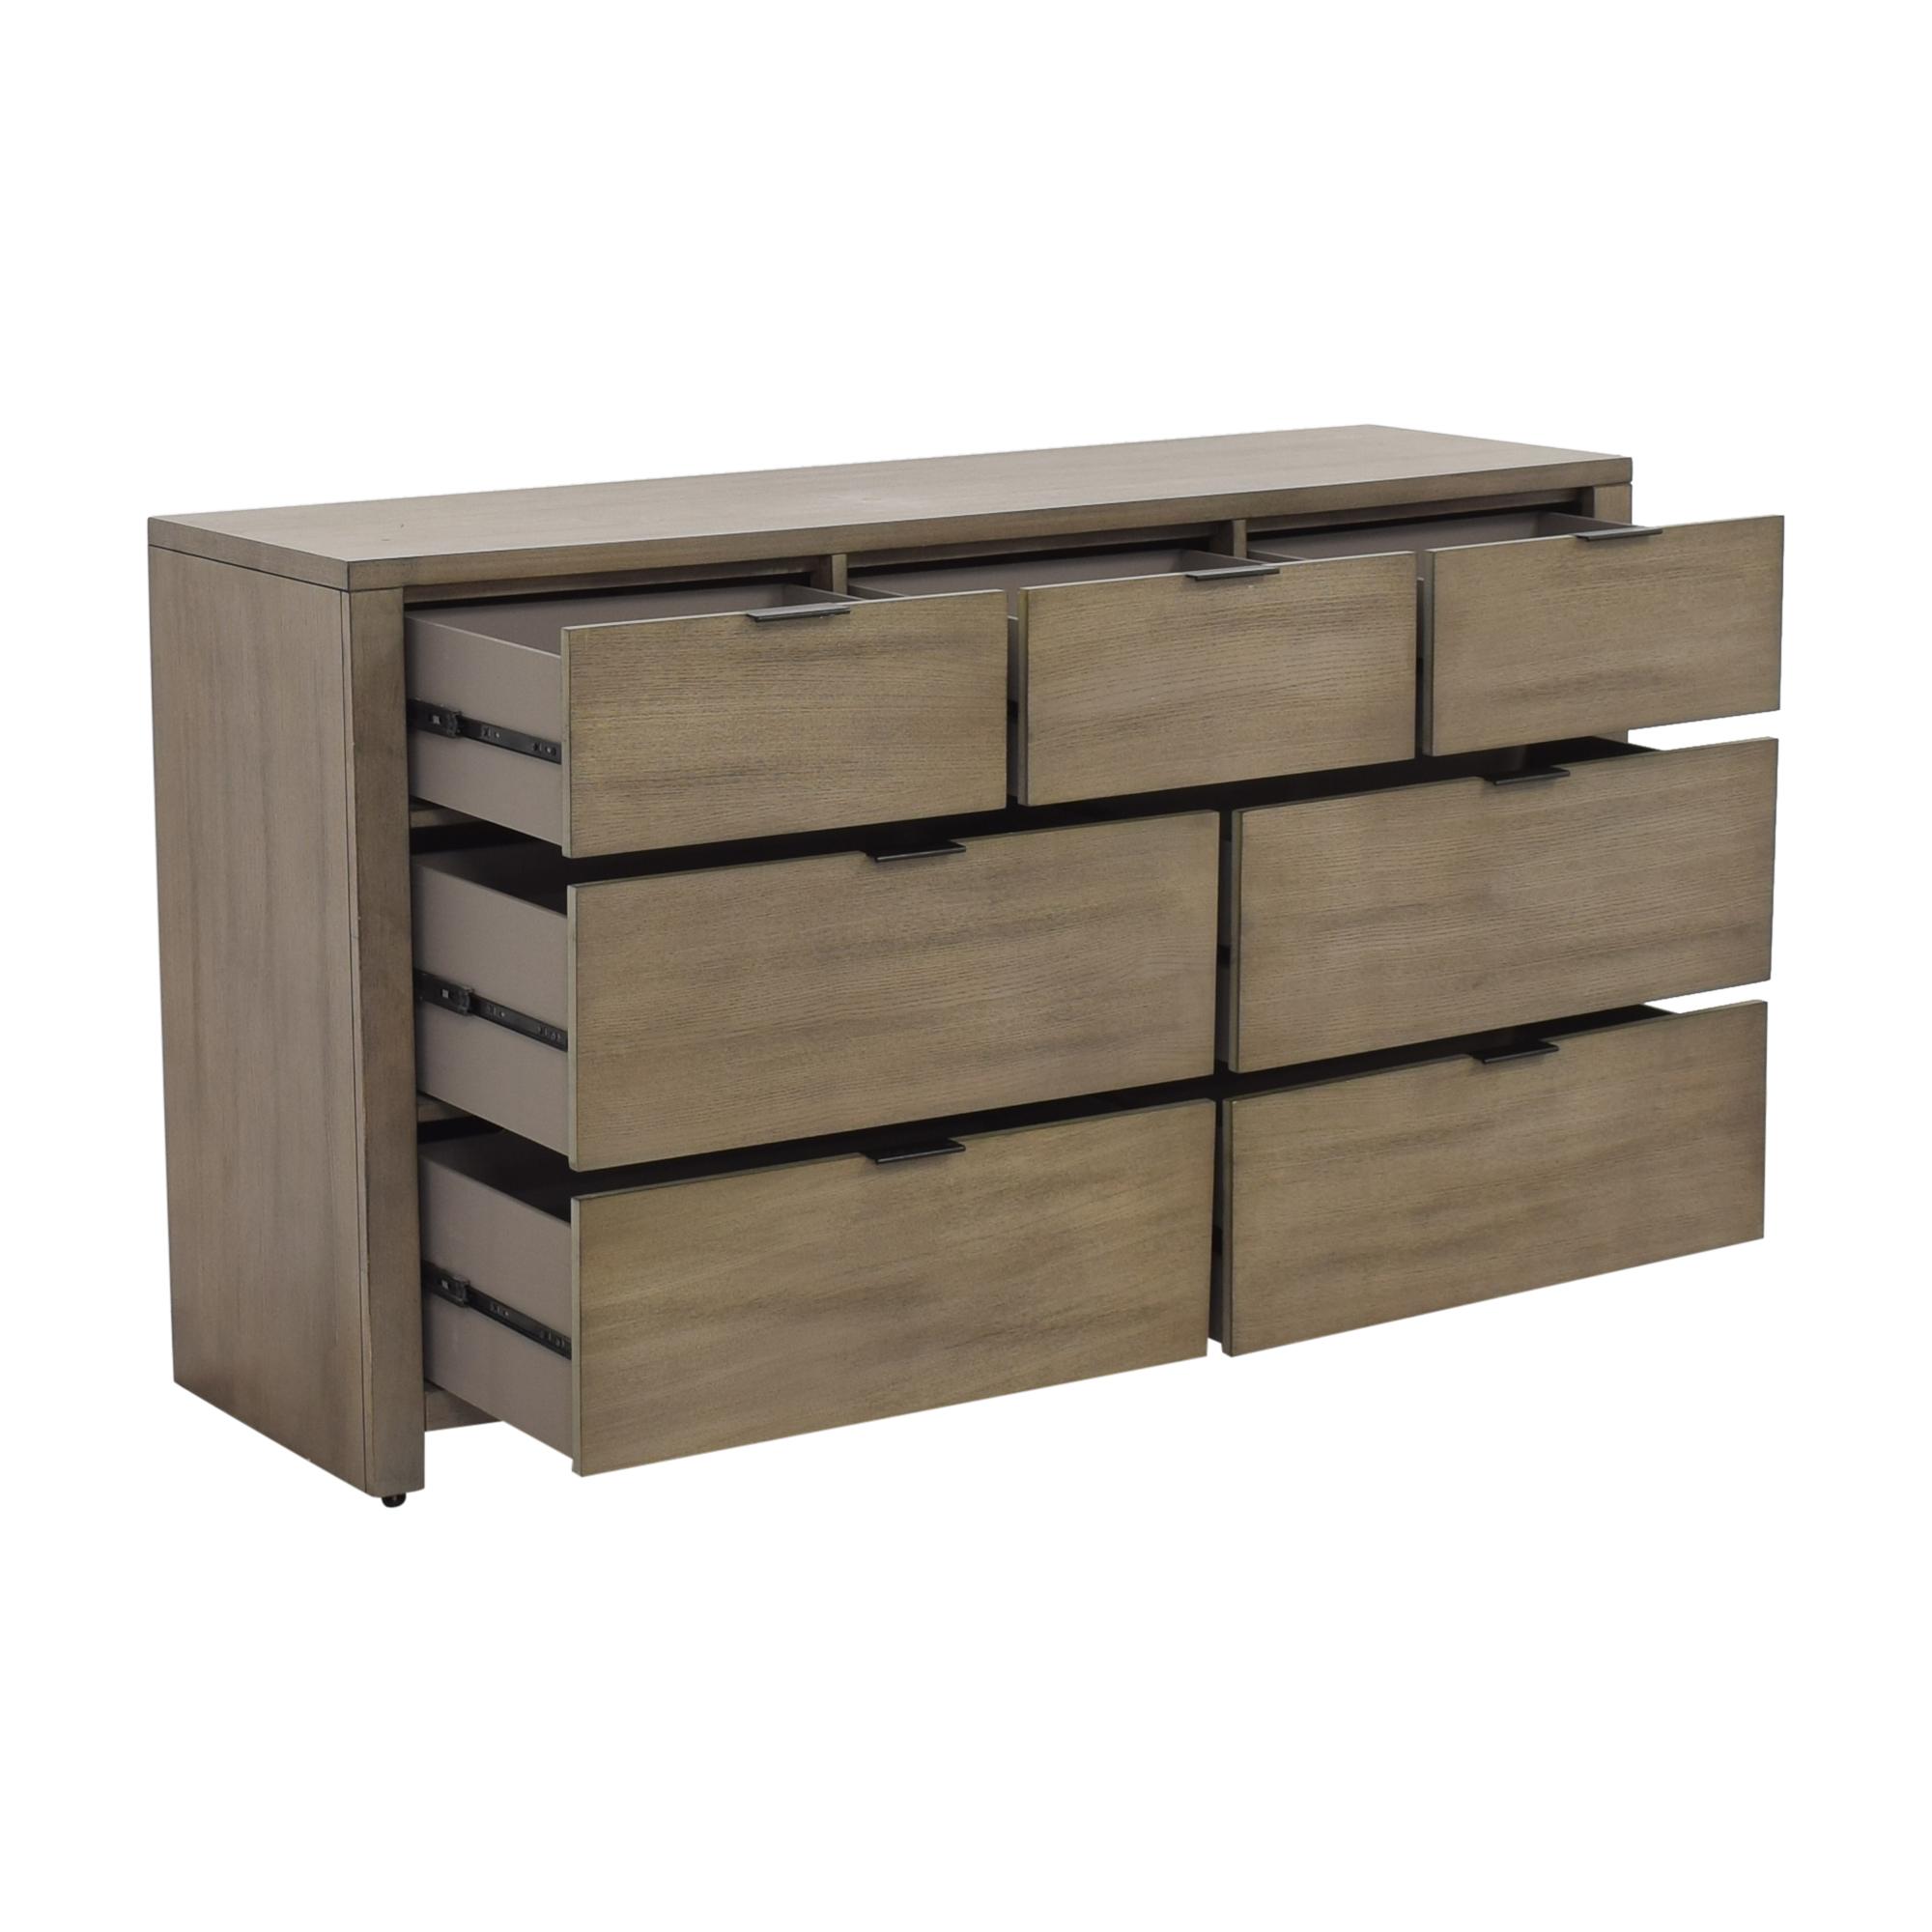 Macy's Tribeca 7 Drawer Dresser / Dressers